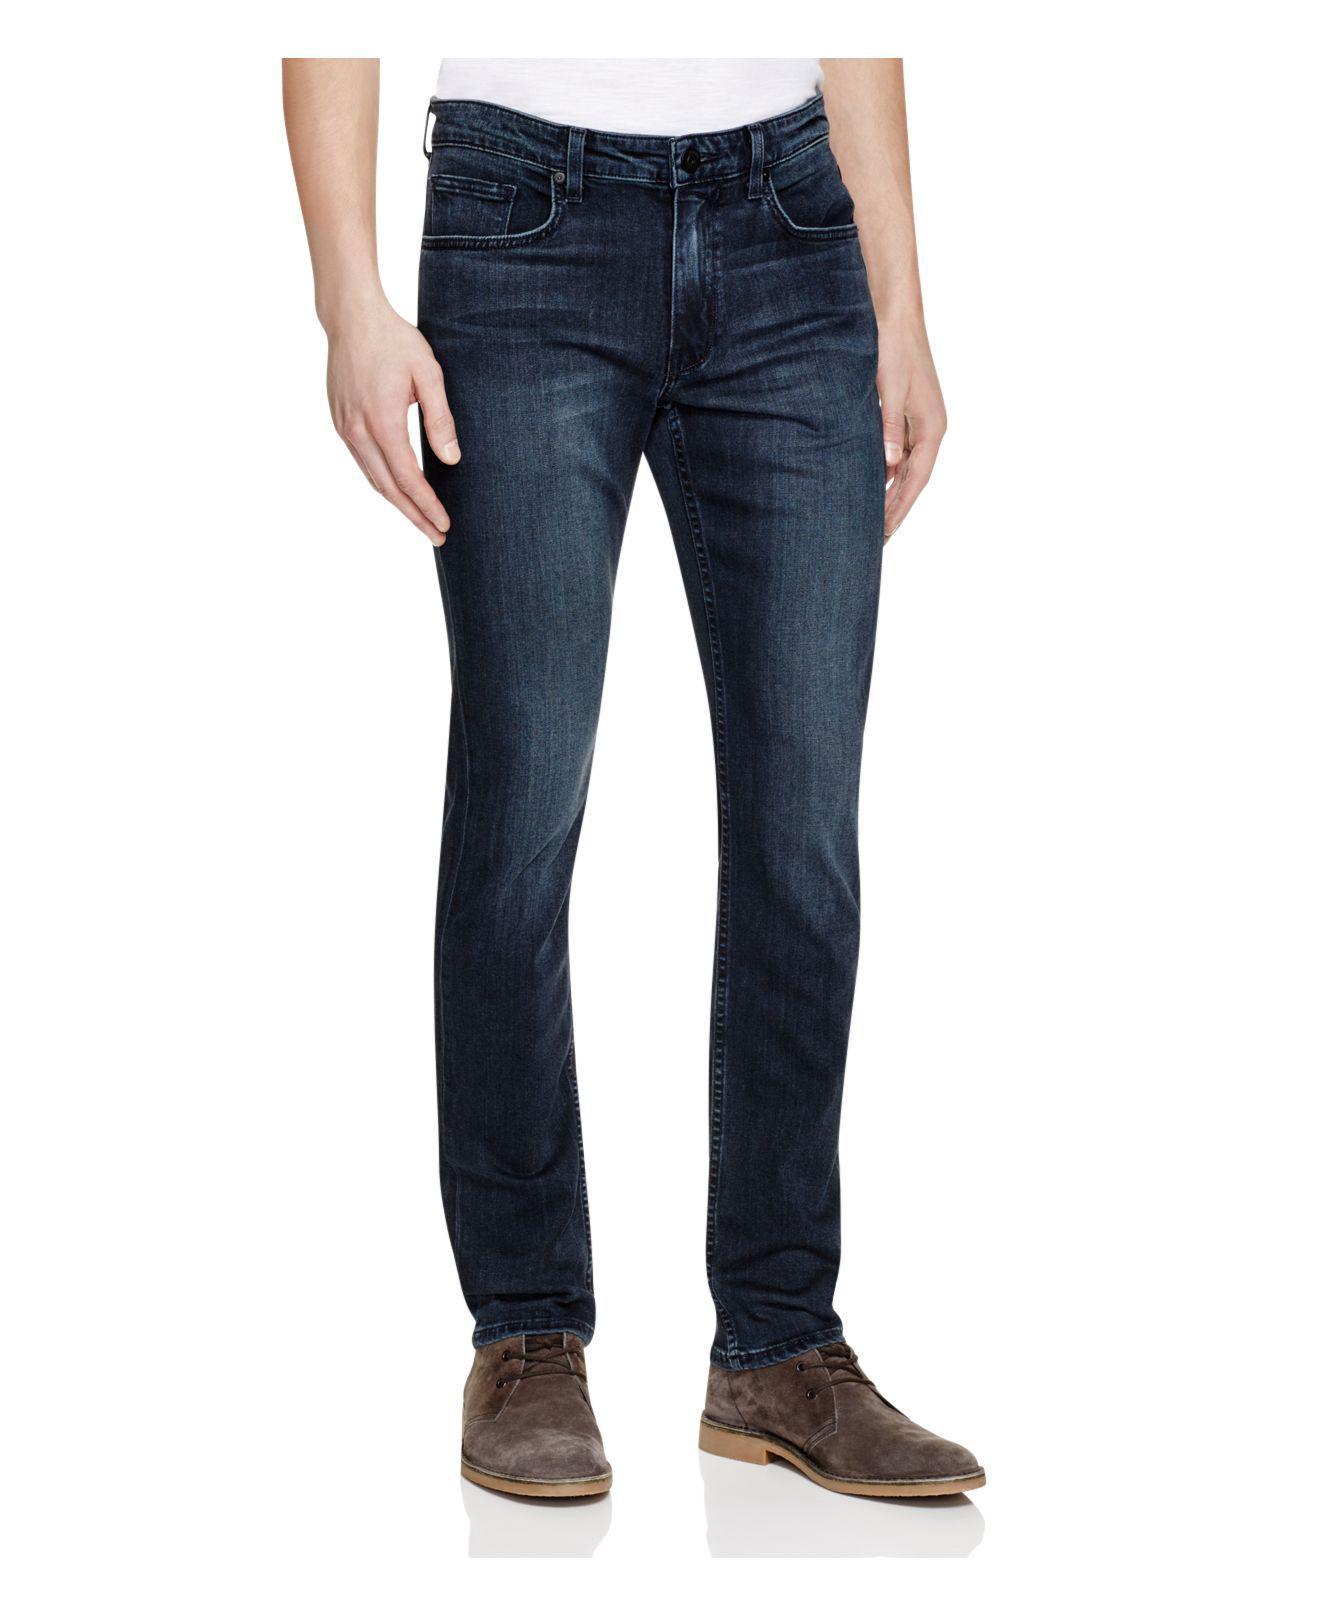 Lennox jeans - Blue Paige l7riQHQQm